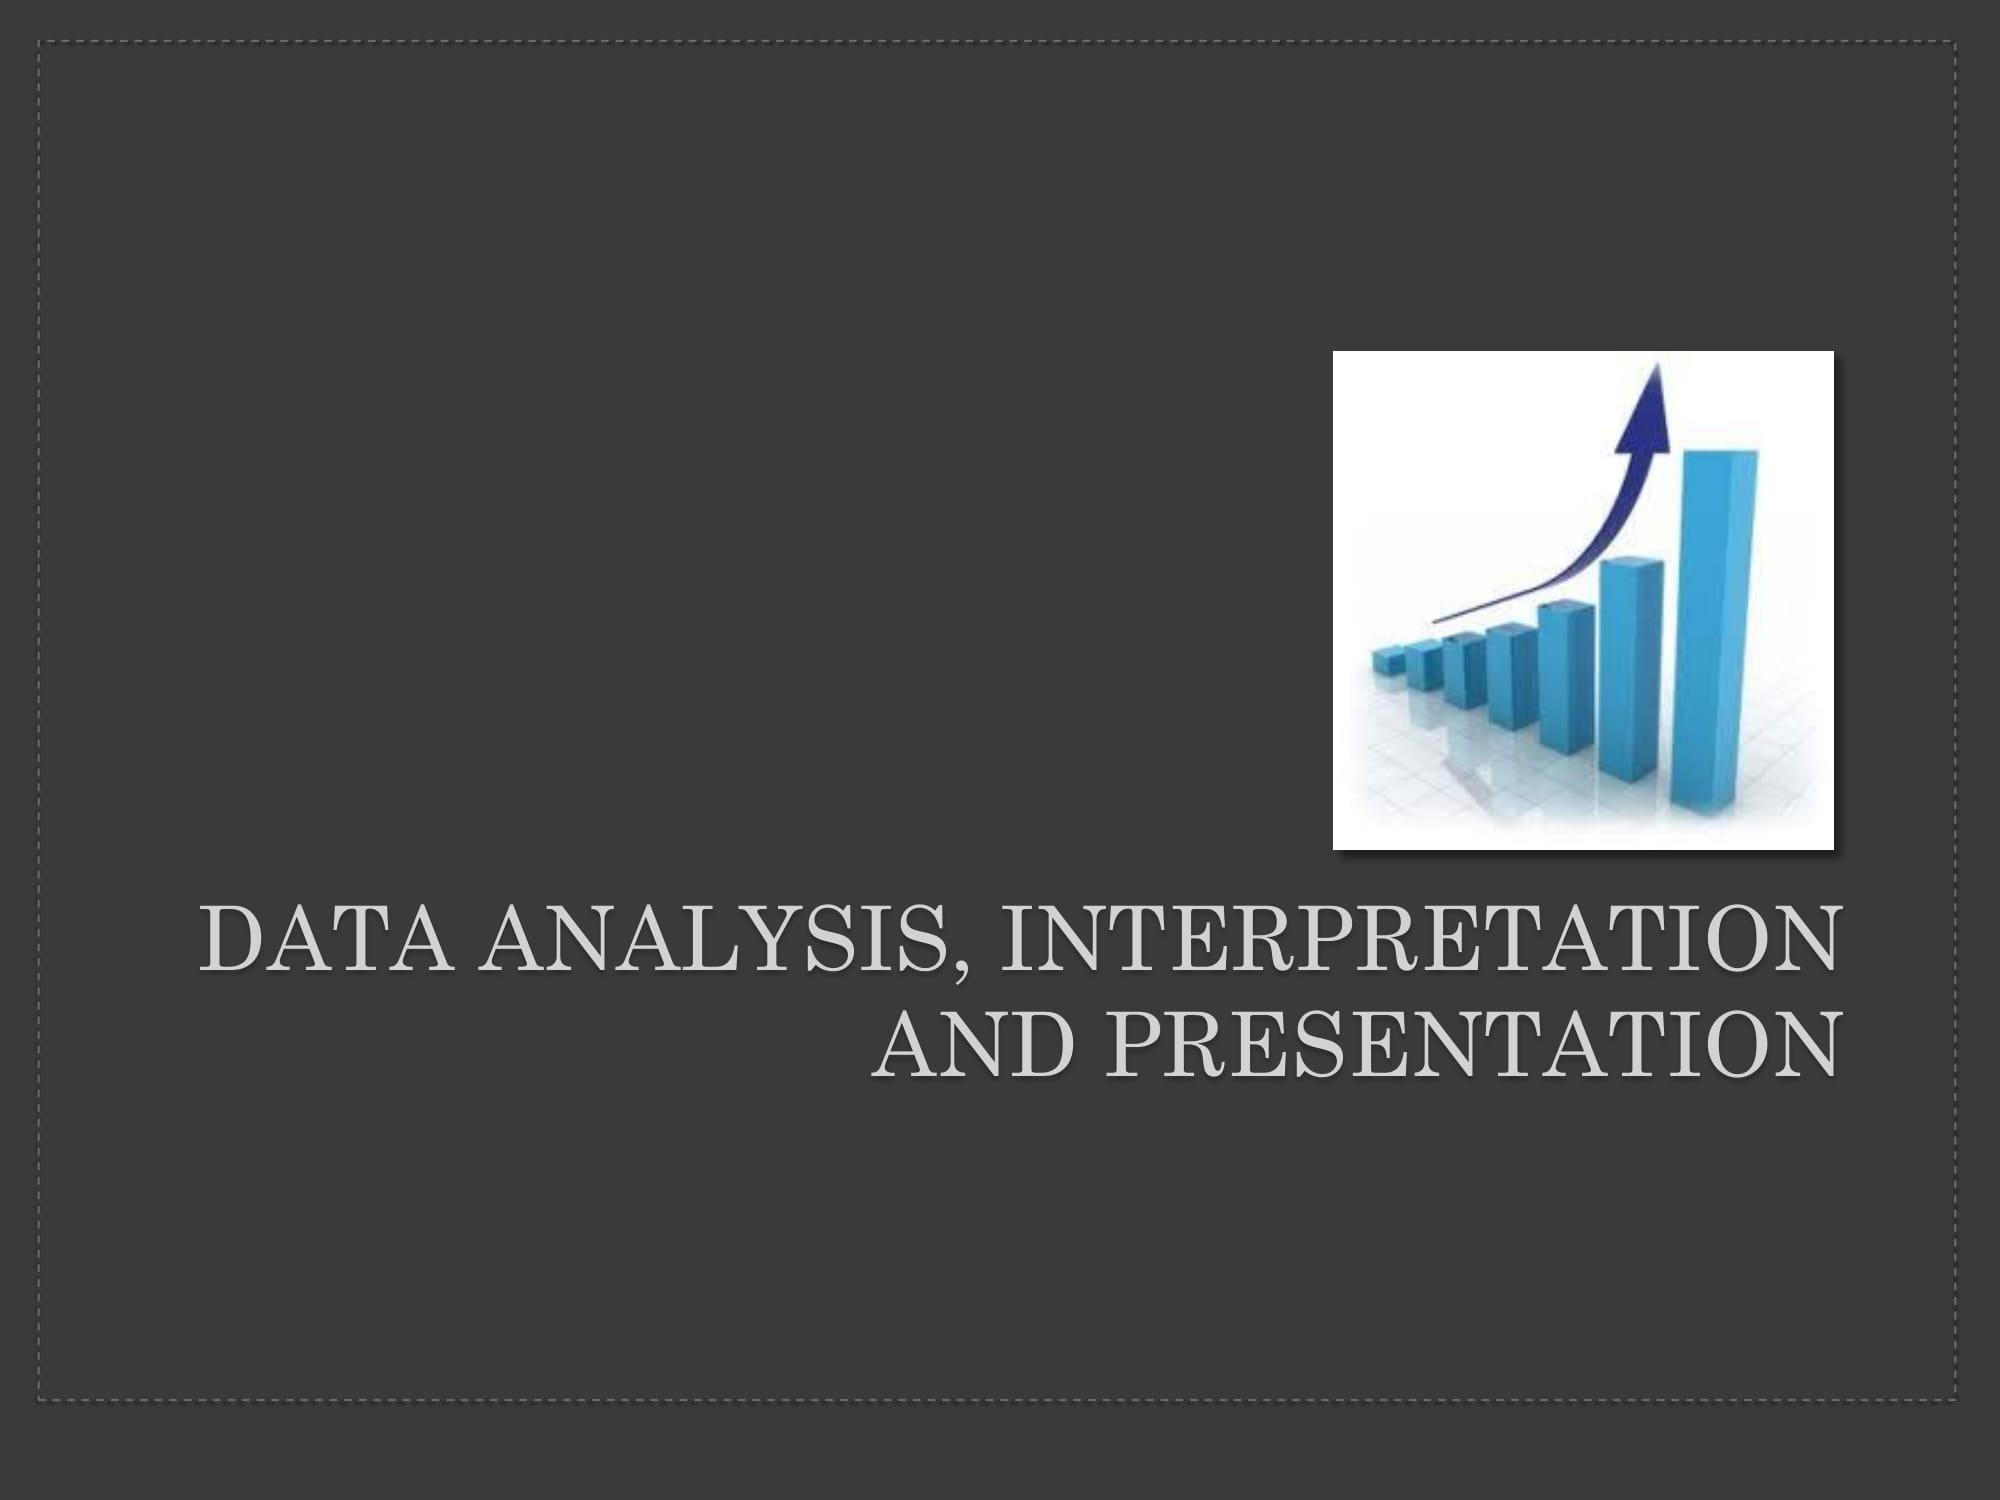 data analysis interpretation and presentation example 01